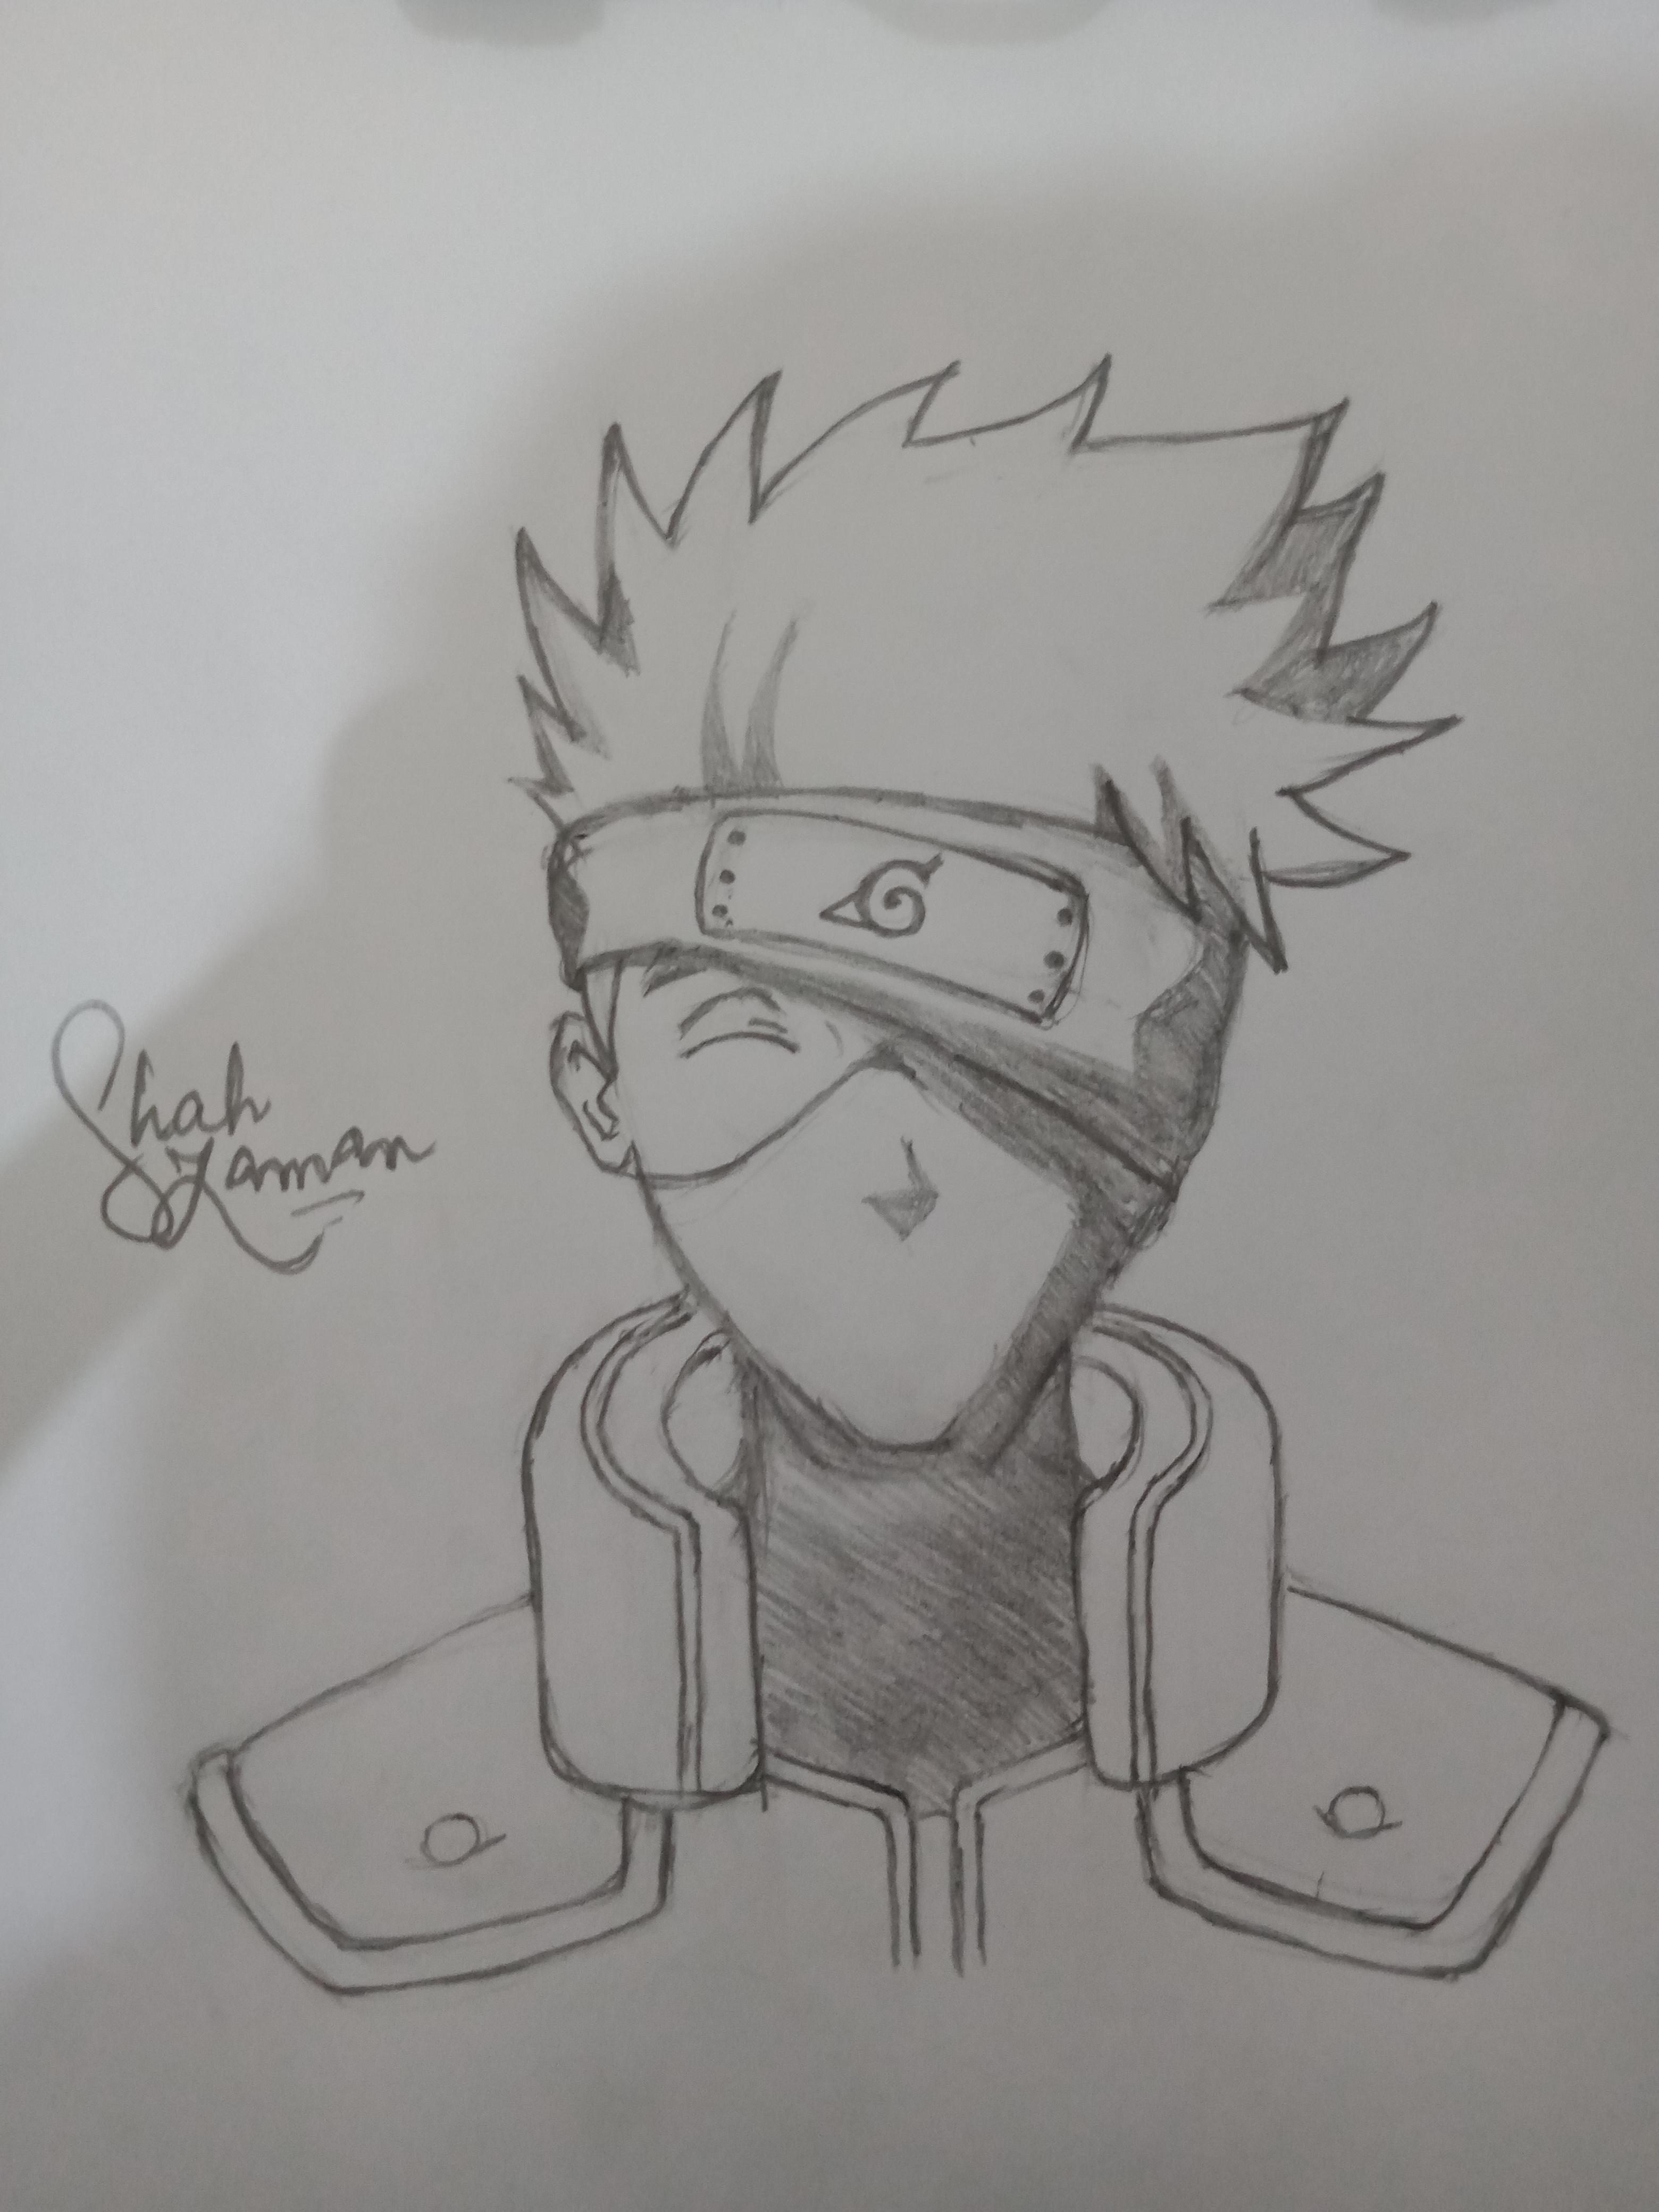 Kakashi Hatake Drawing : kakashi, hatake, drawing, Kakashi, Hatake, Drawing, Naruto